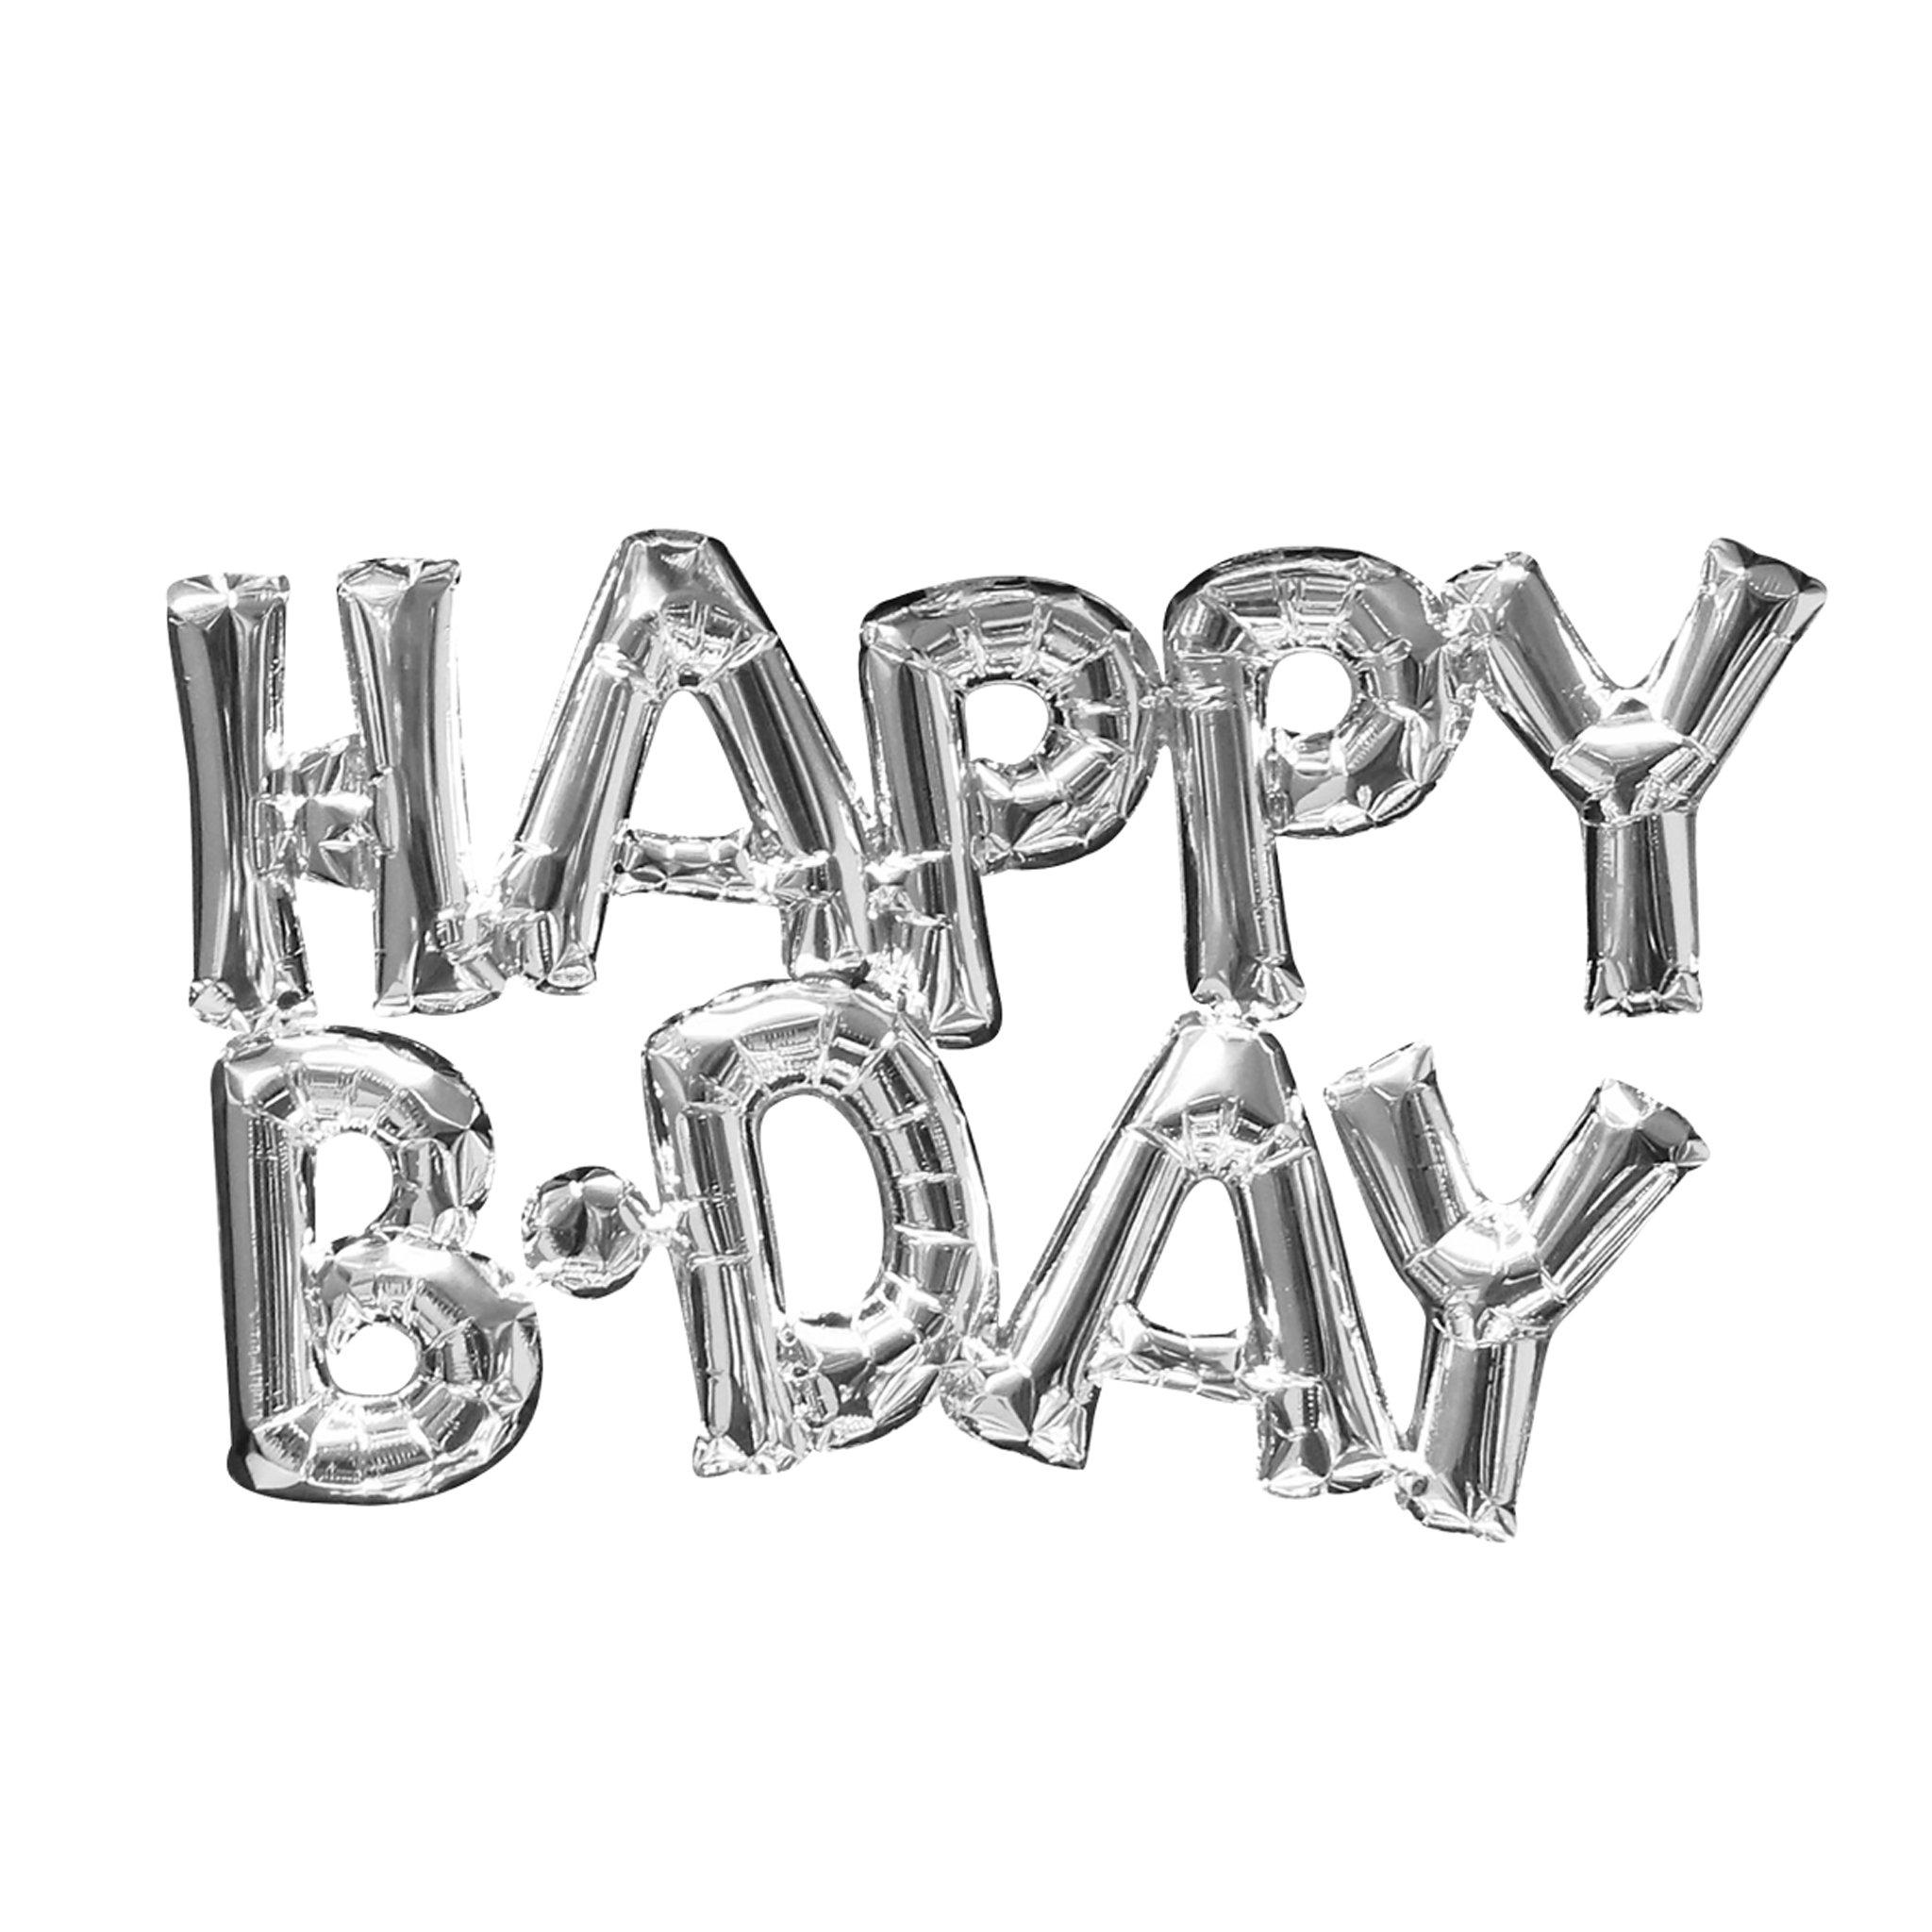 BUY ME / NEW ITEM $9.99 each HAPPY B•DAY Silver Foil Balloon 30in x 19in